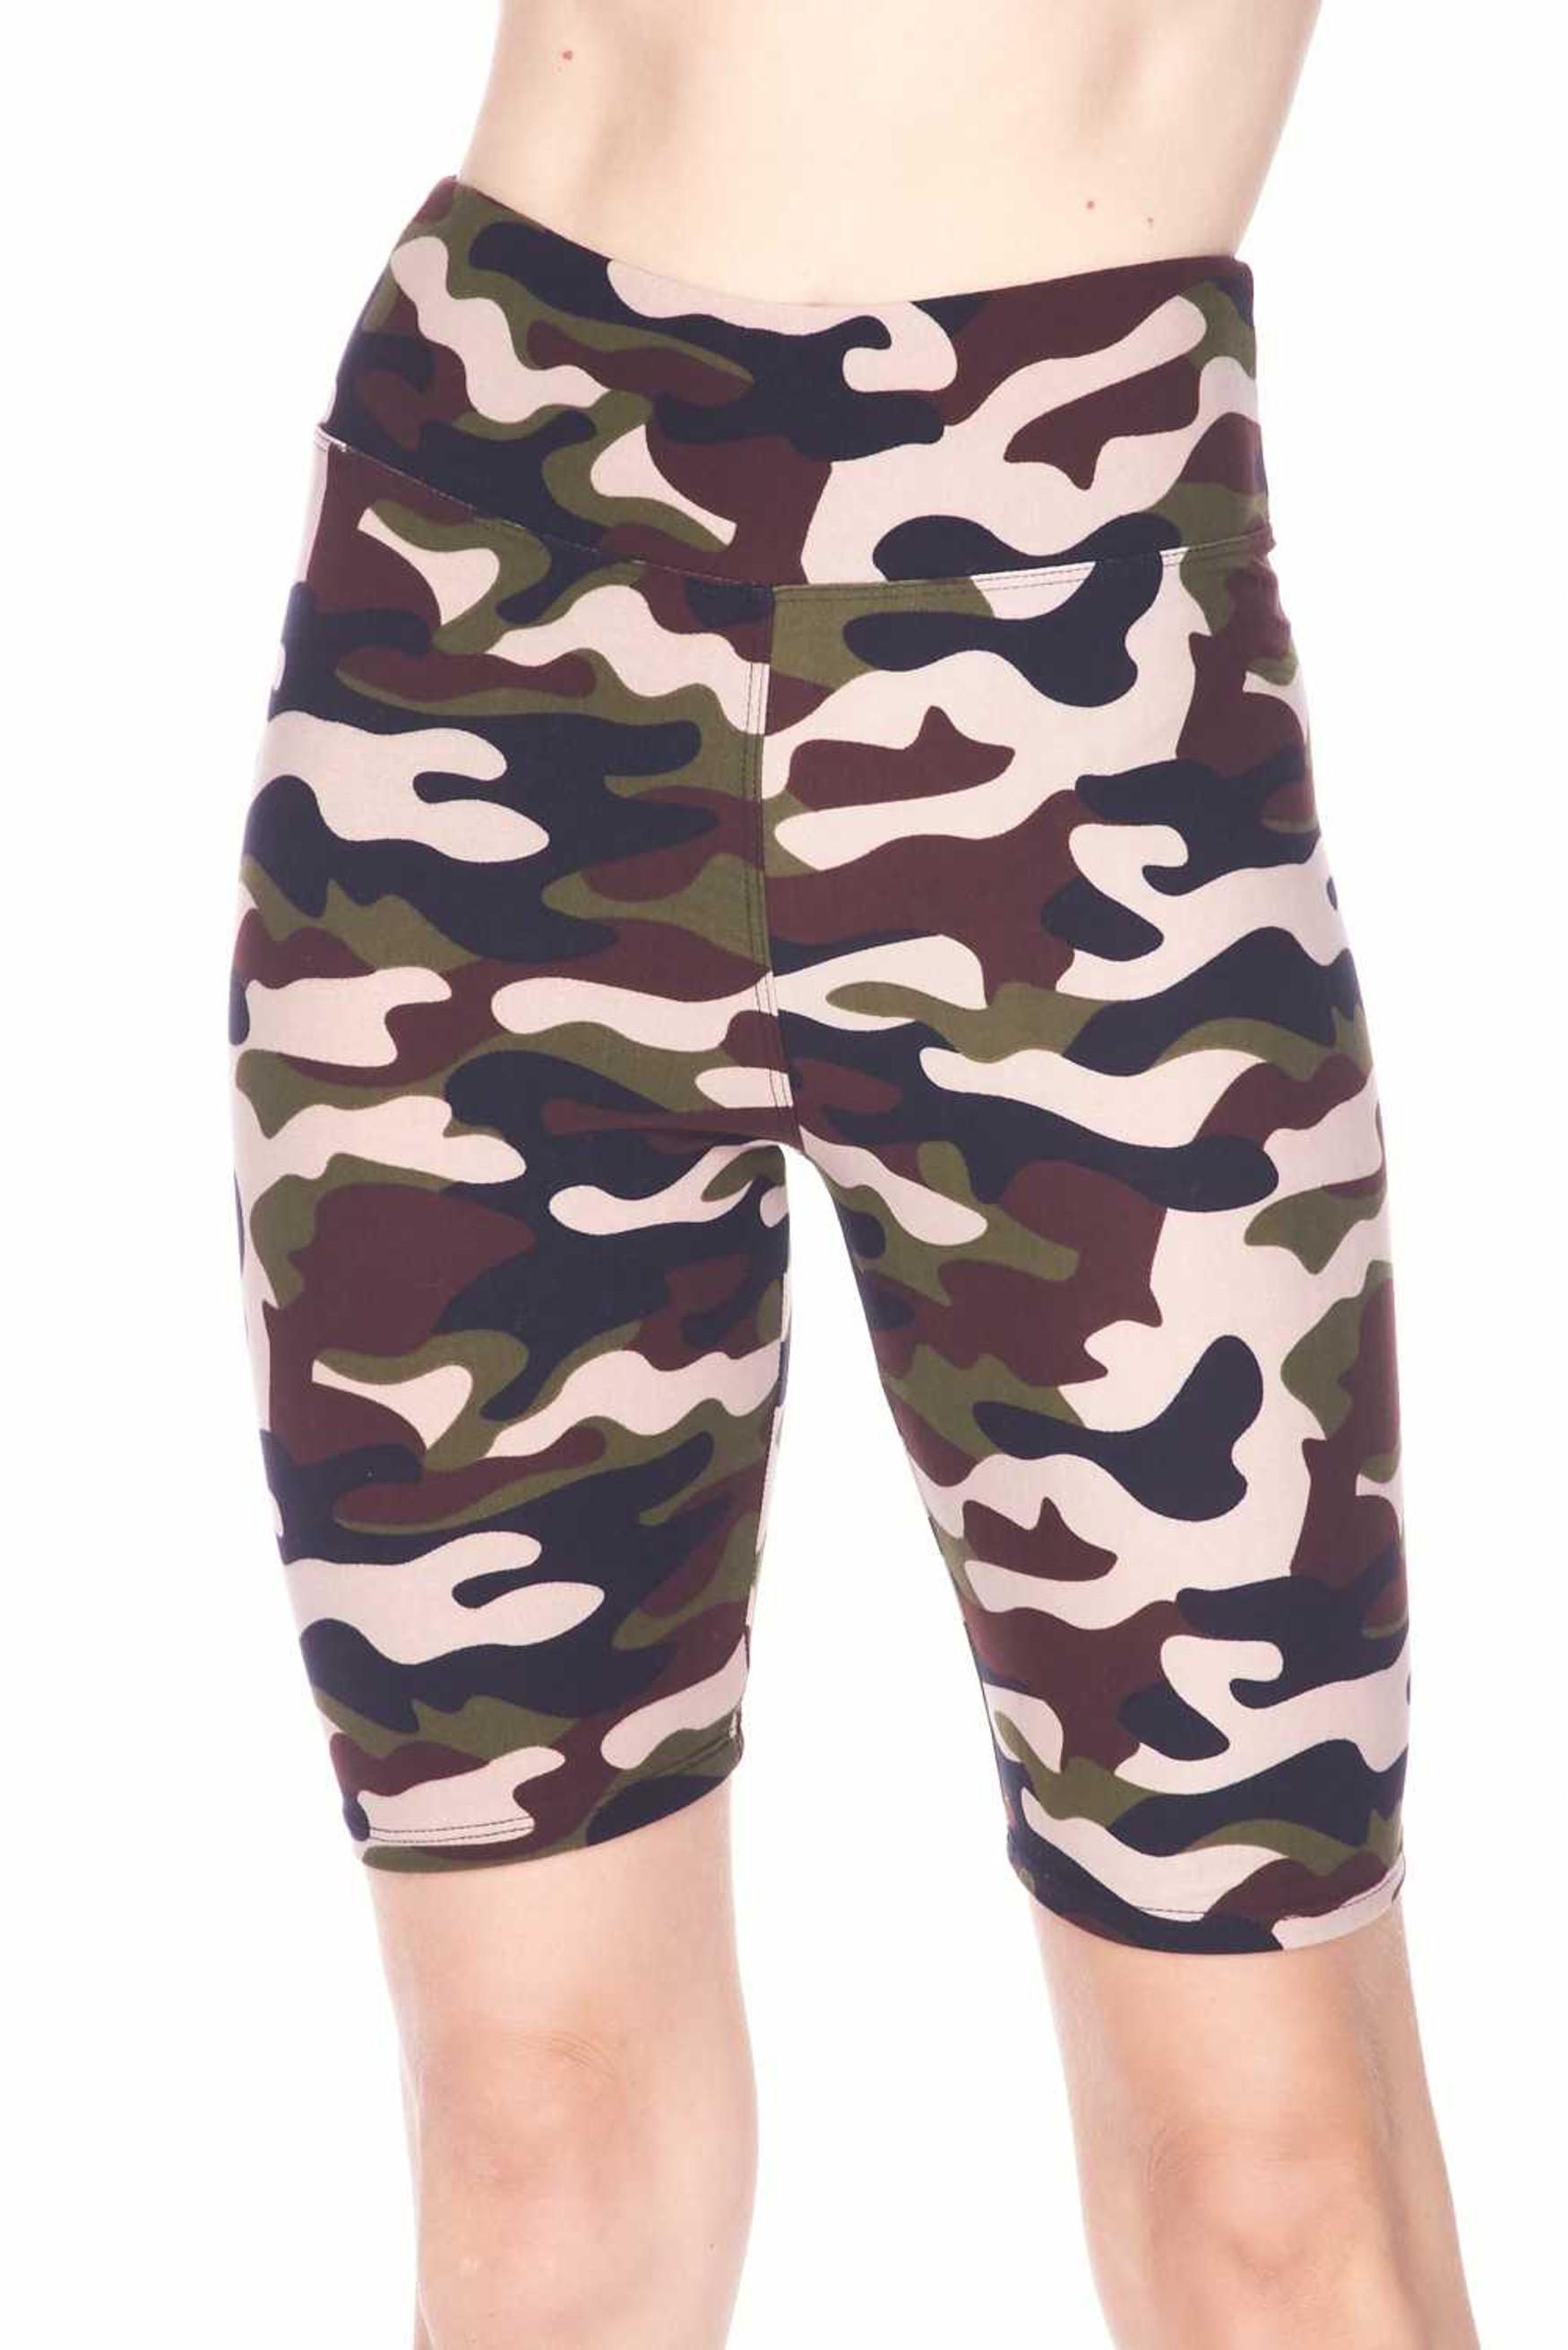 Buttery Soft Flirty Camouflage Biker Shorts - 3 Inch Waist Band